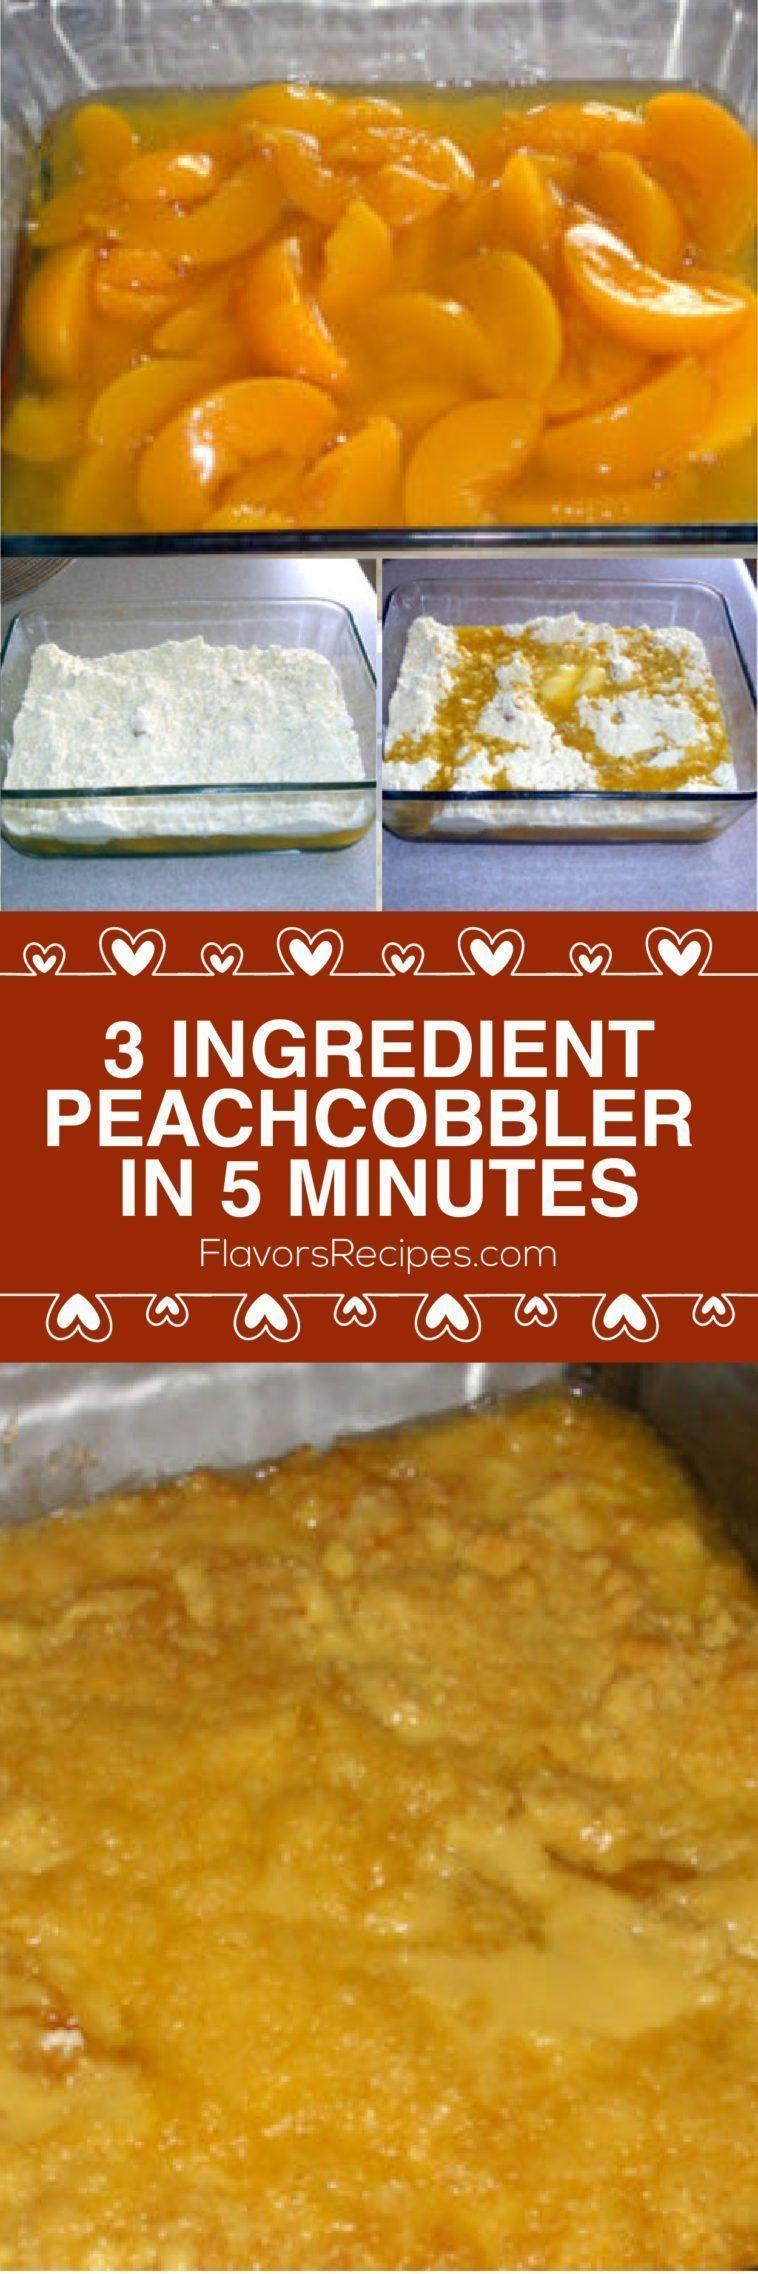 3 INGREDIENT PEACH COBBLER IN 5 MINUTES #peachcobblerpoundcake 3 INGREDIENT PEACH COBBLER IN 5 MINUTES #peachcobblerpoundcake 3 INGREDIENT PEACH COBBLER IN 5 MINUTES #peachcobblerpoundcake 3 INGREDIENT PEACH COBBLER IN 5 MINUTES #peachcobblerpoundcake 3 INGREDIENT PEACH COBBLER IN 5 MINUTES #peachcobblerpoundcake 3 INGREDIENT PEACH COBBLER IN 5 MINUTES #peachcobblerpoundcake 3 INGREDIENT PEACH COBBLER IN 5 MINUTES #peachcobblerpoundcake 3 INGREDIENT PEACH COBBLER IN 5 MINUTES #peachcobblerpoundc #peachcobblerpoundcake